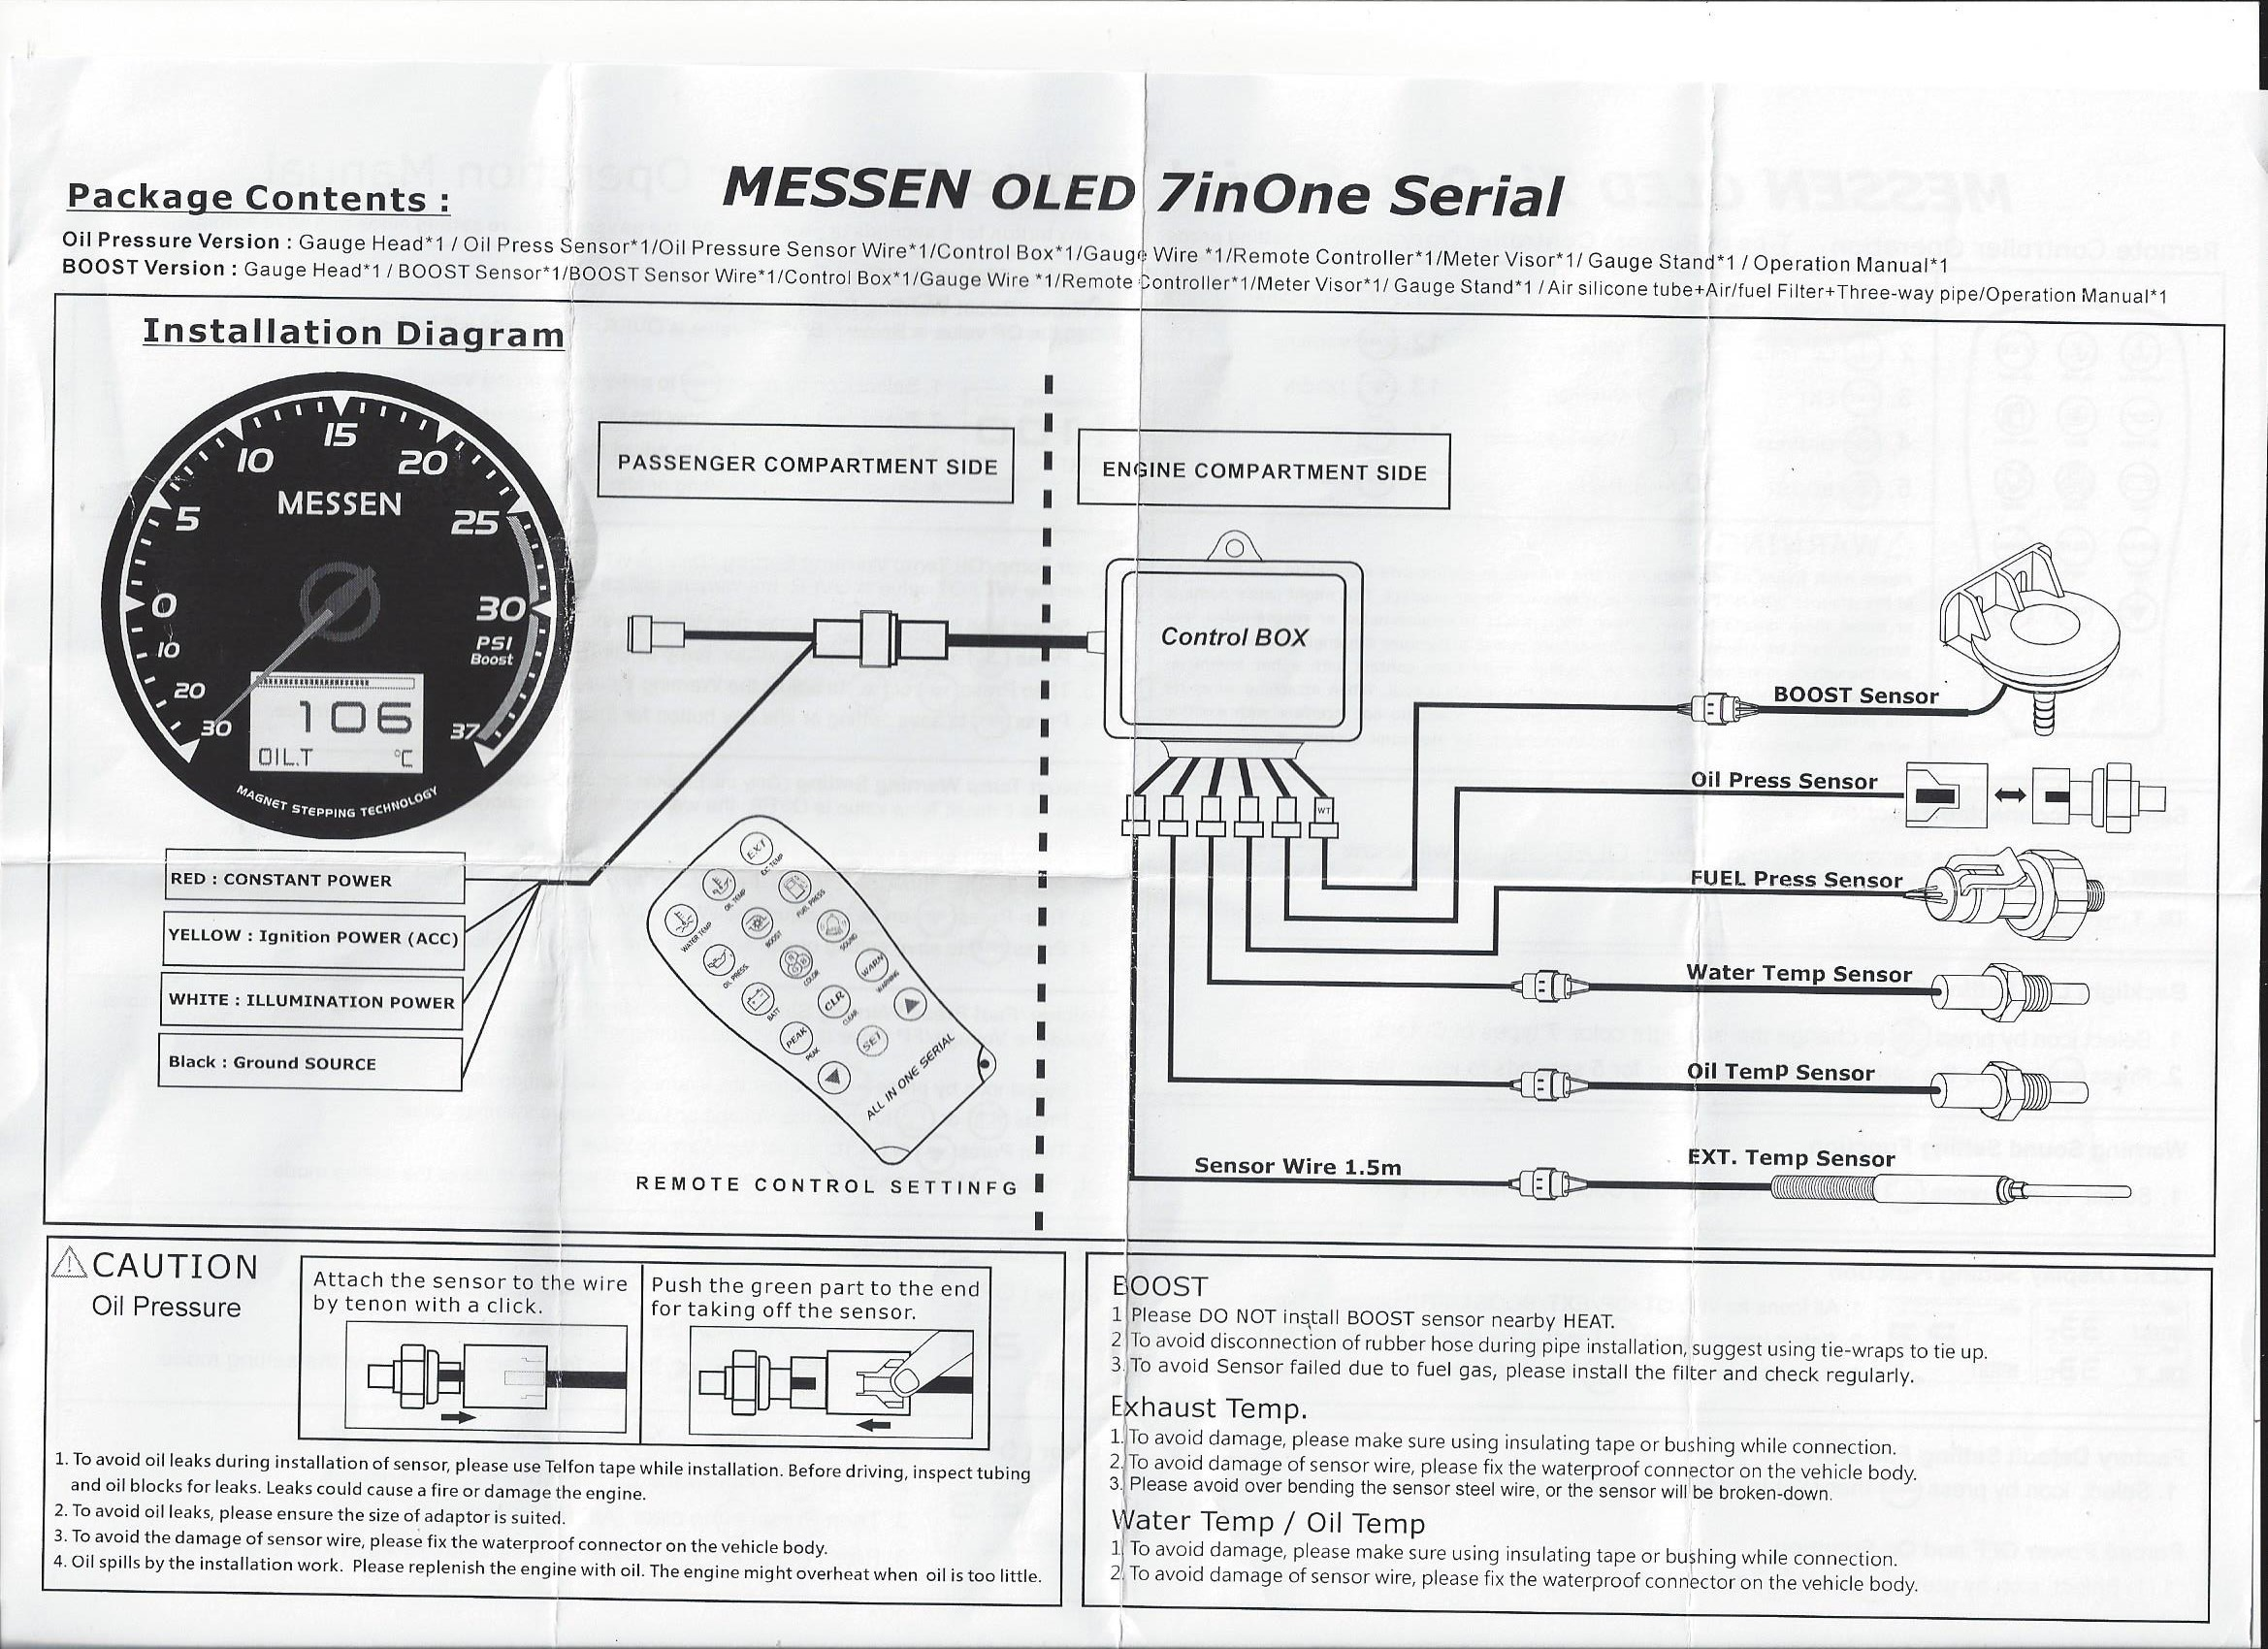 Air Fuel Ratio Gauge Wiring Diagram Gooddy Org In Aem Throughout